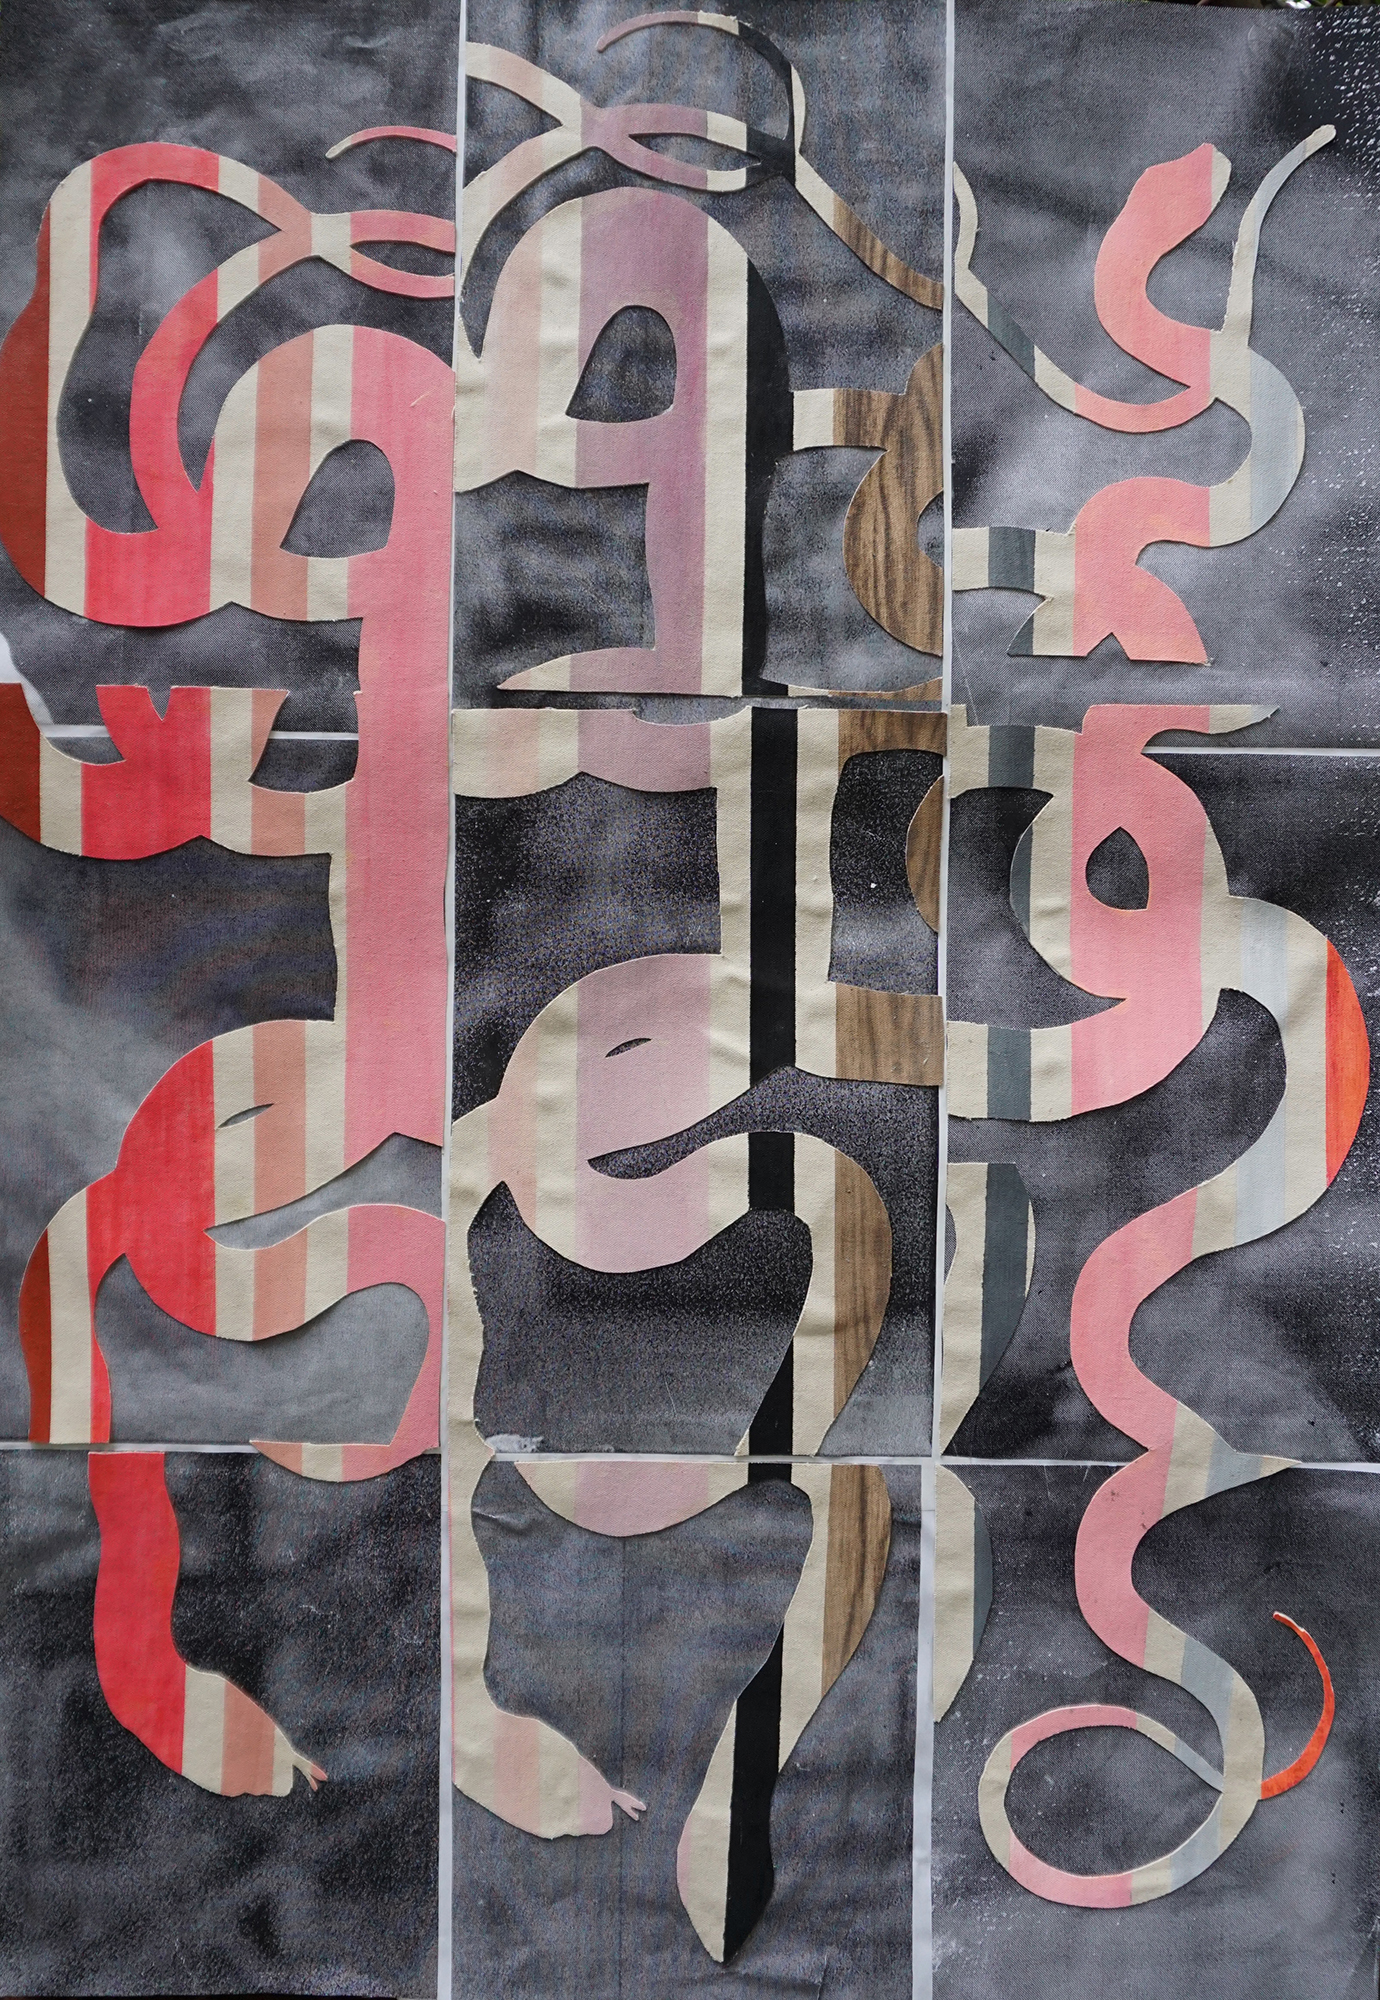 TonyMichaleEstrada - Intecessors - 44 x 31.5 - pastels on canvas cutouts on photo print collage - 2018 - $350.jpg